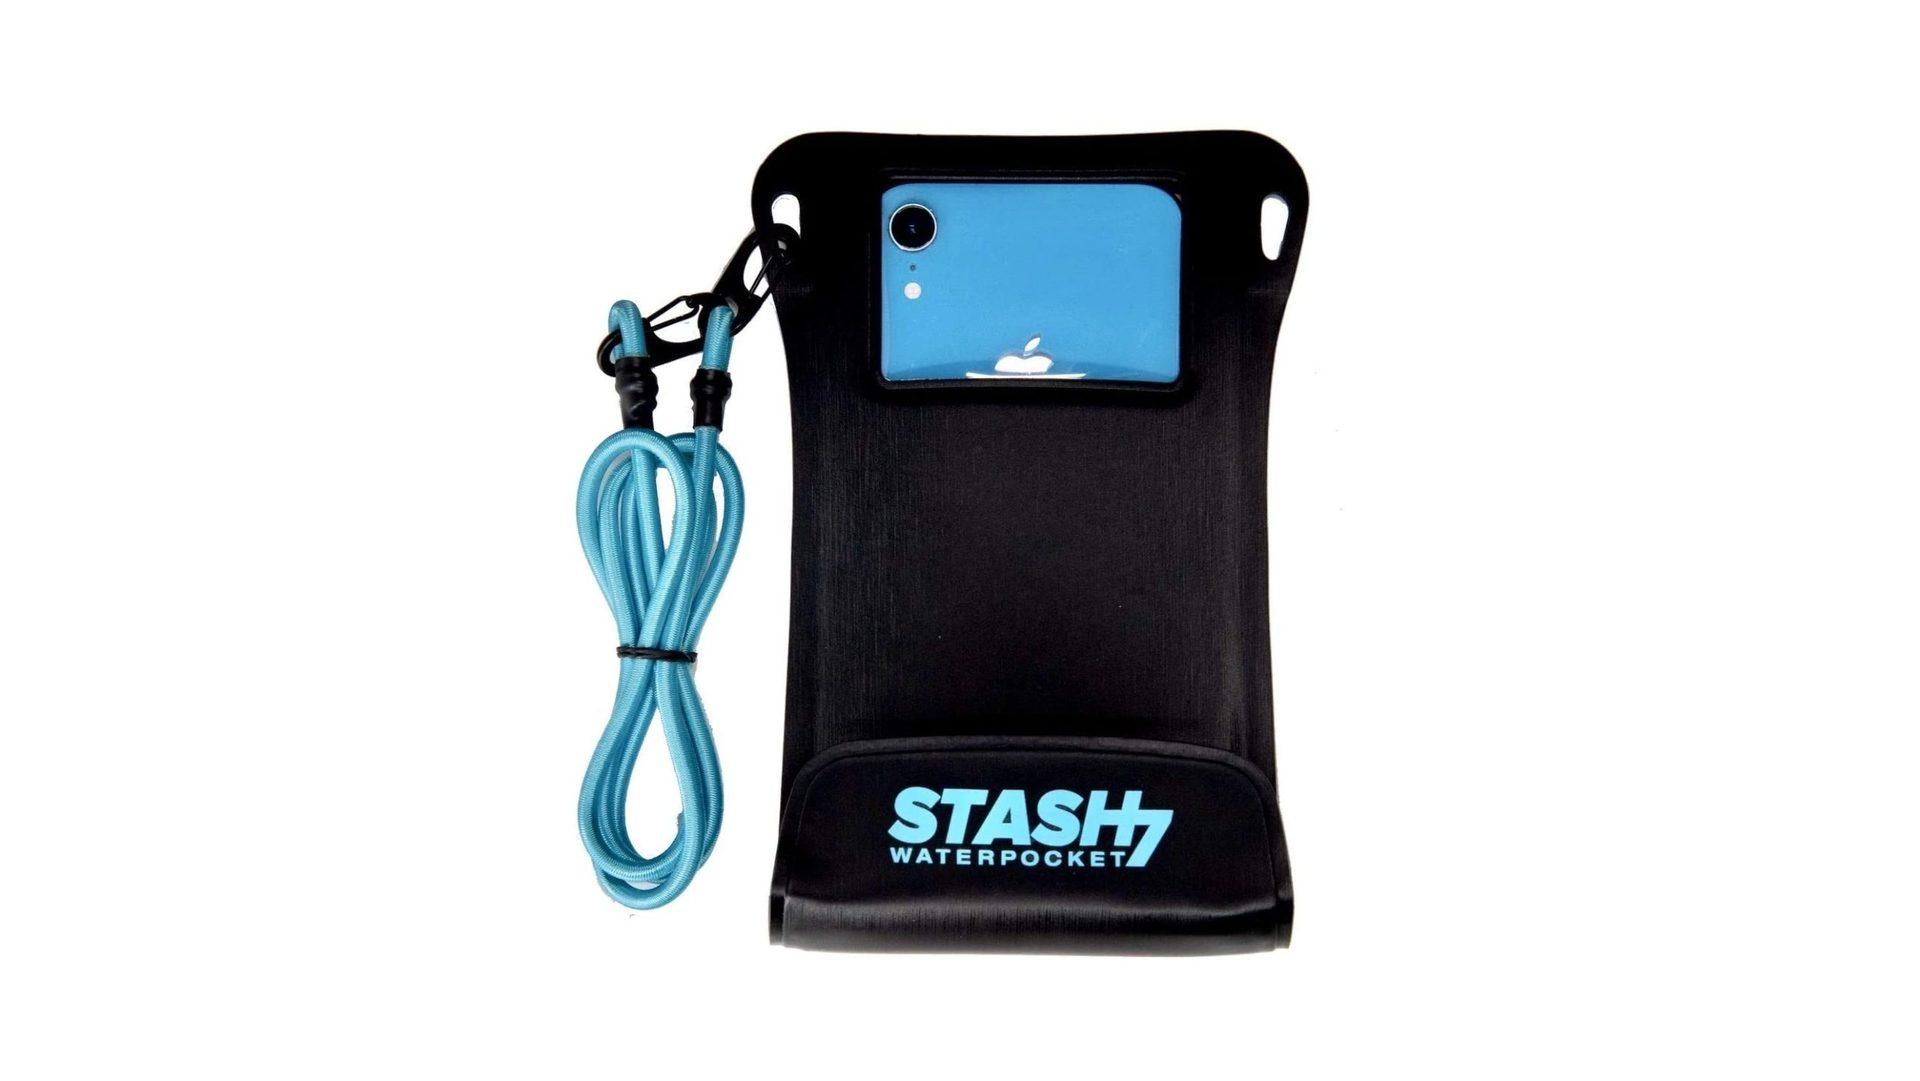 Stash7 Waterpocket 01